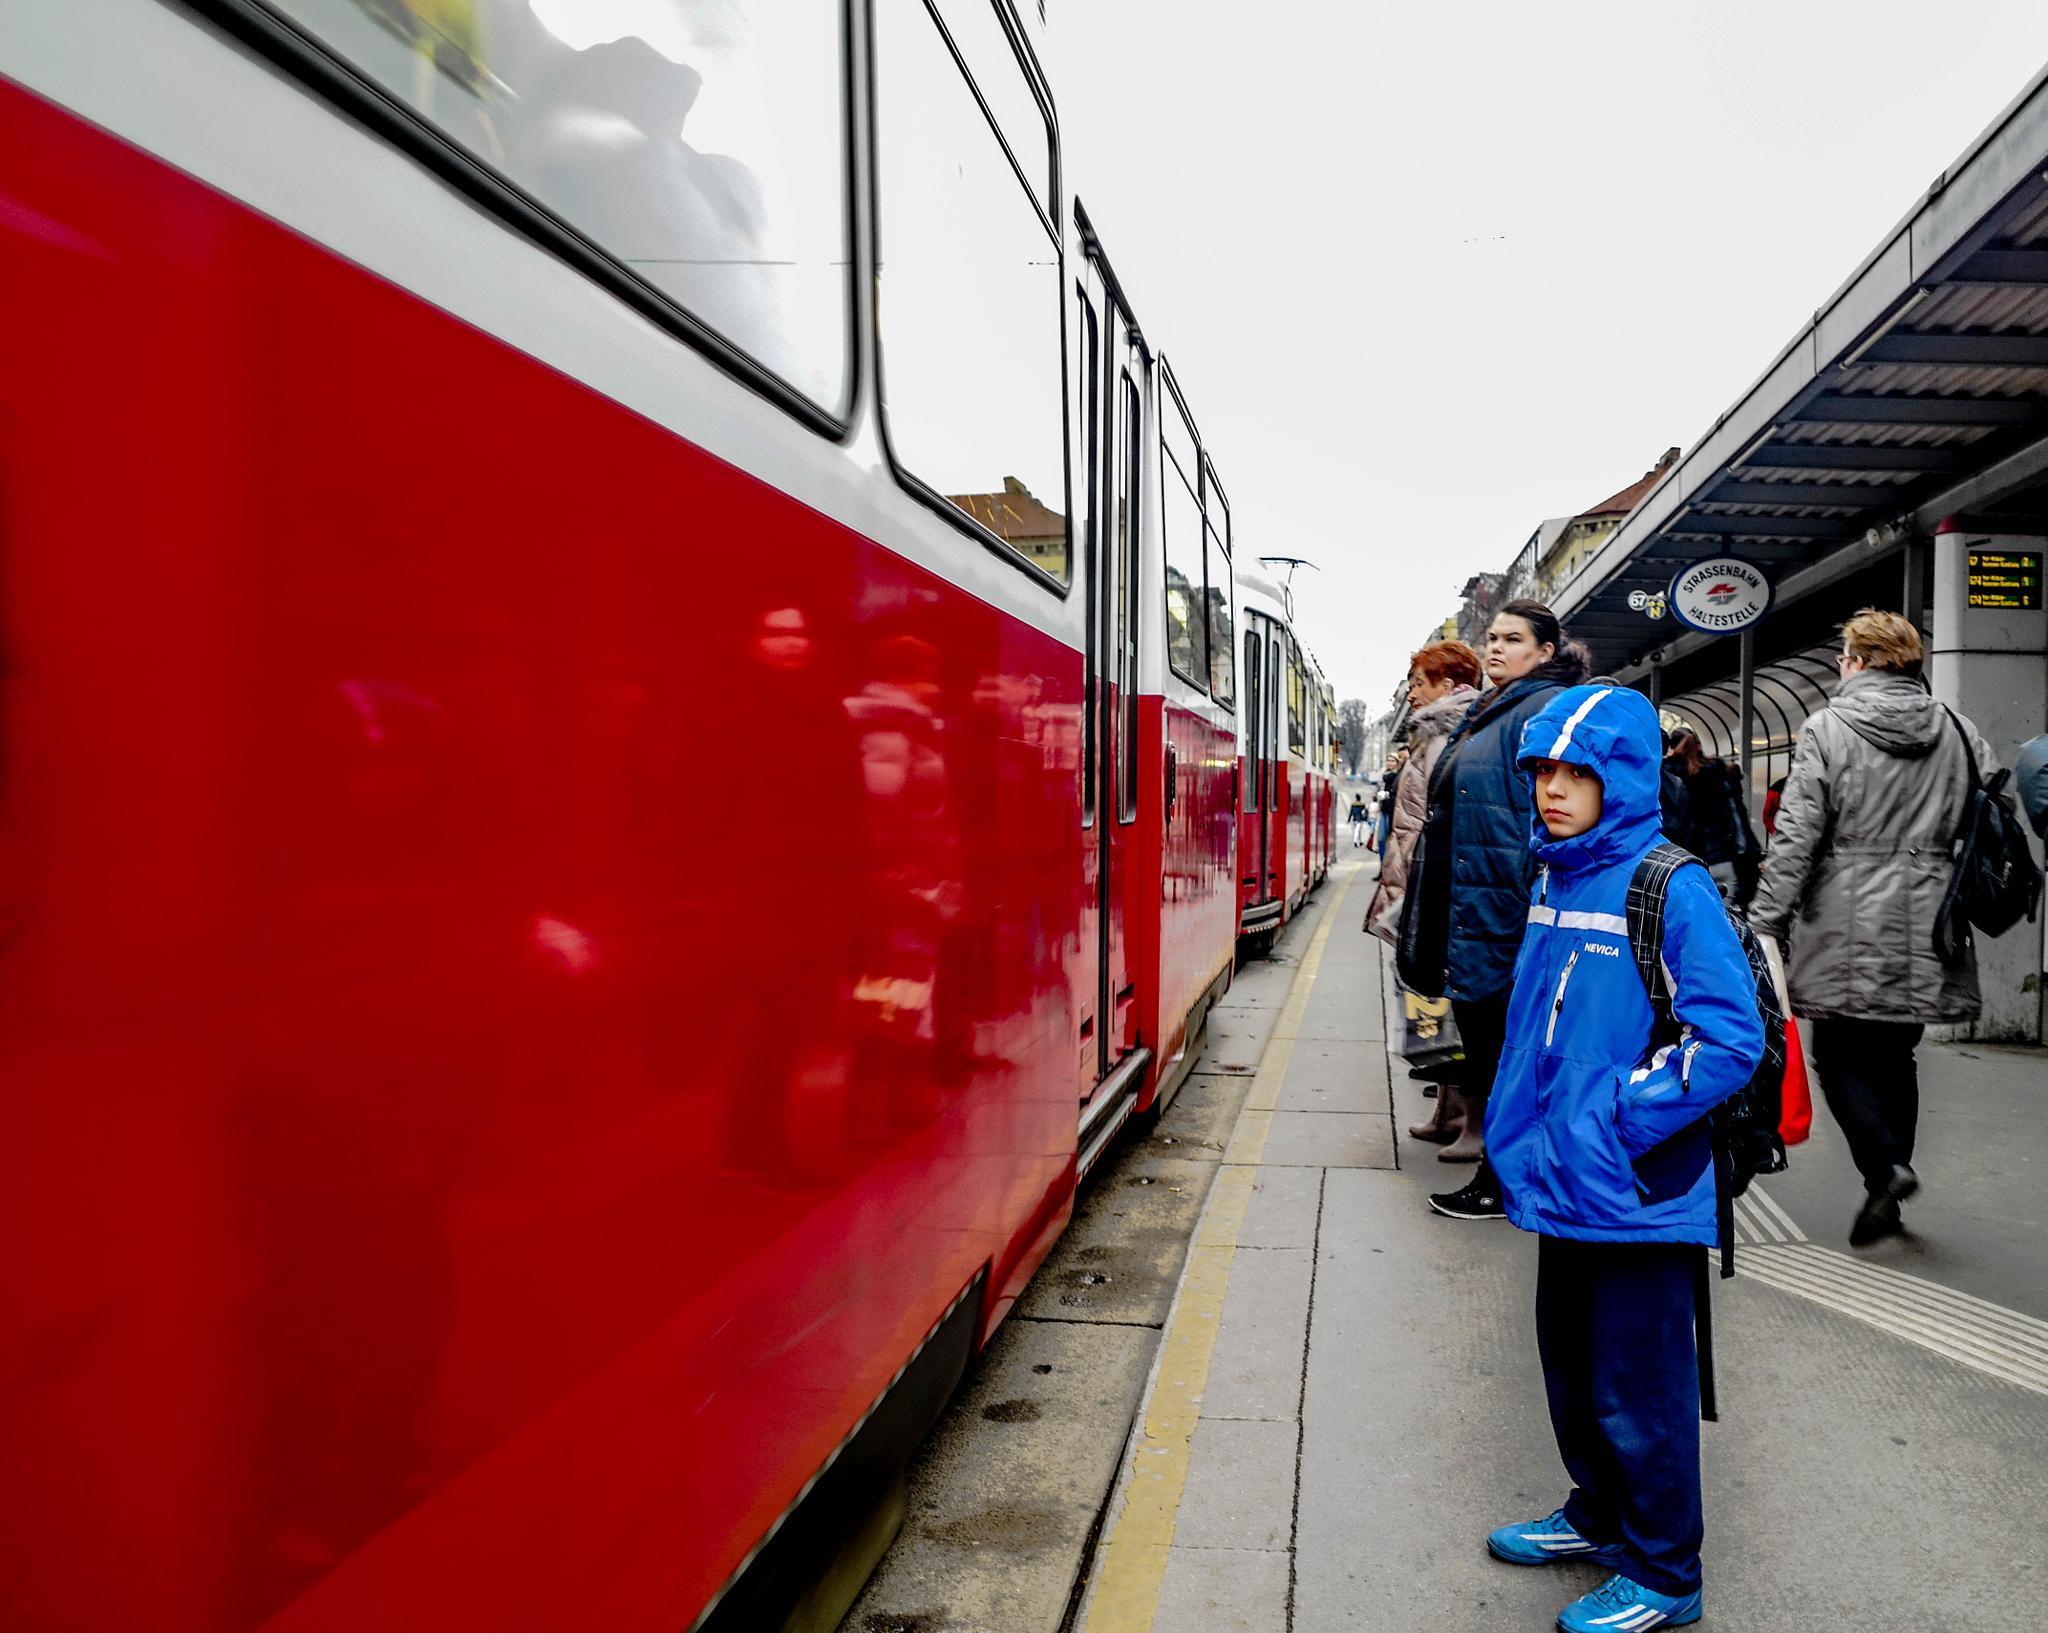 Tram station by Filip